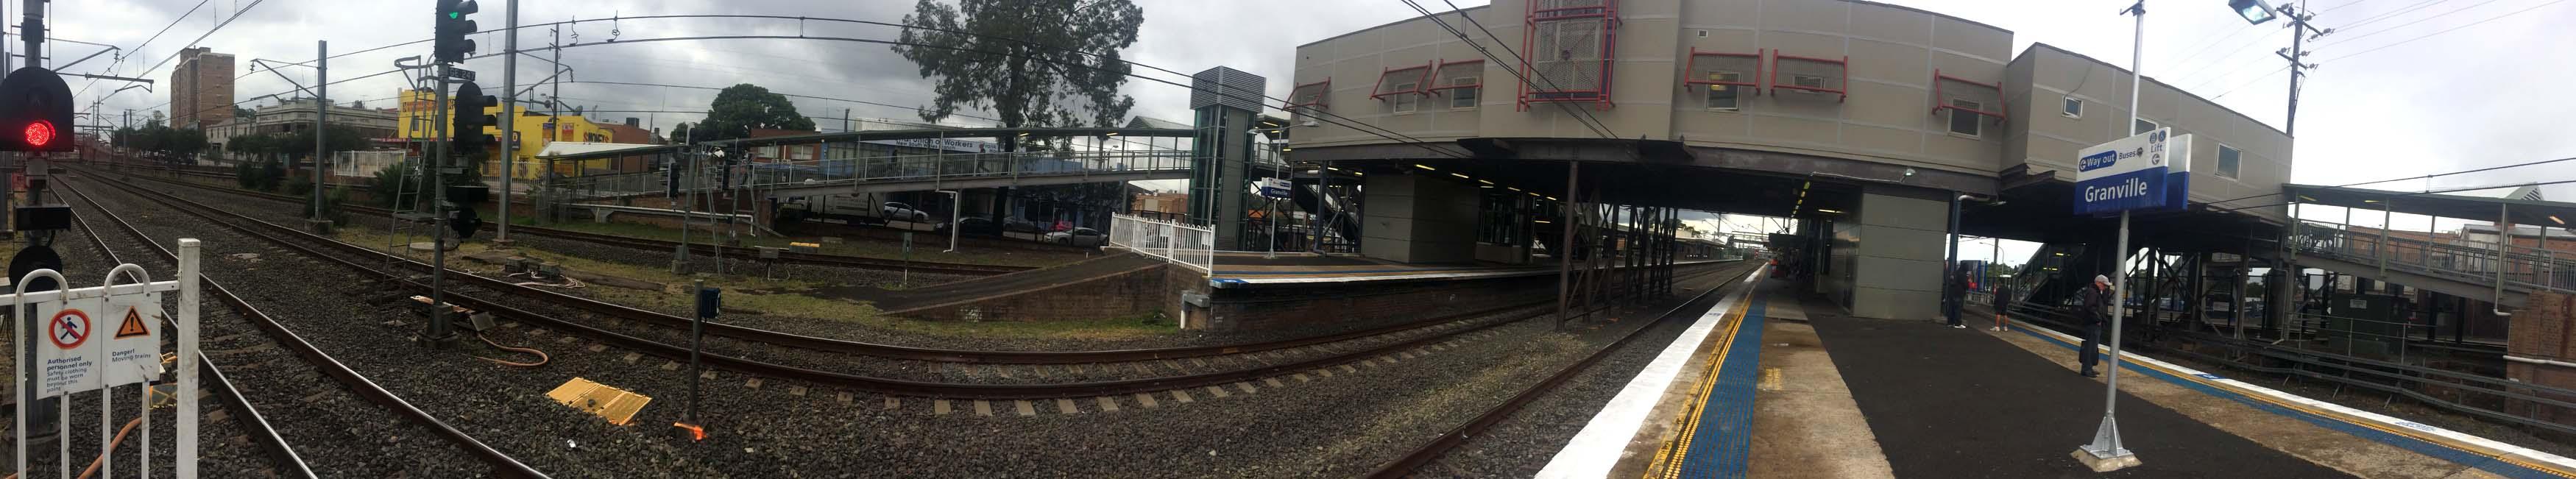 01 Sydney Trains Granville Station Train on Track